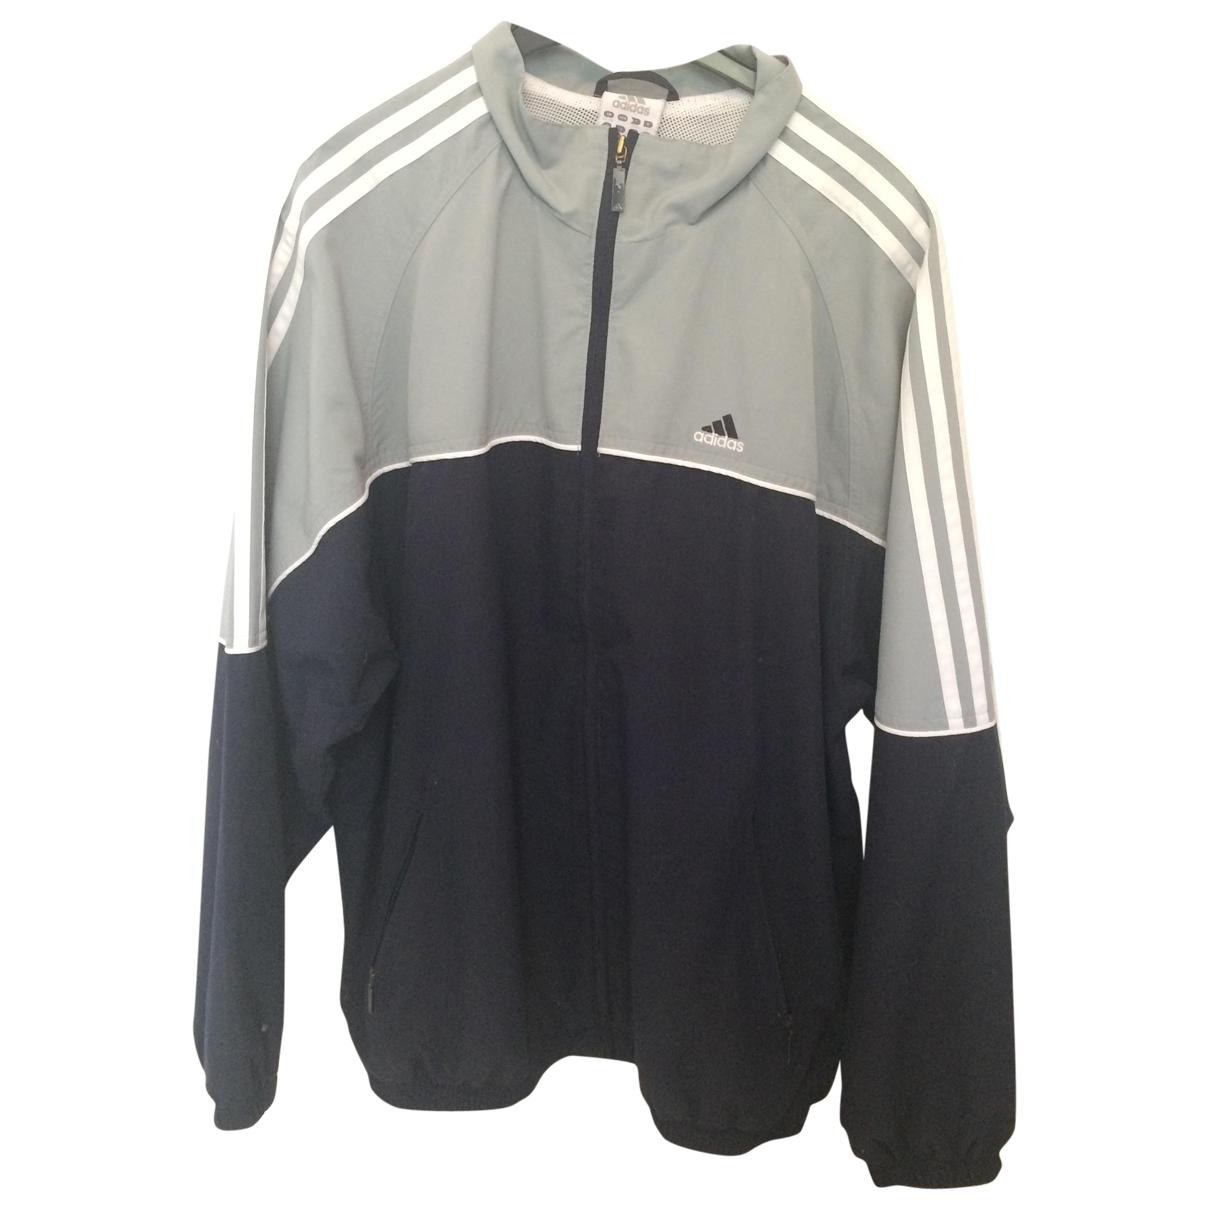 Adidas \N Grey Cotton jacket  for Men 38 UK - US